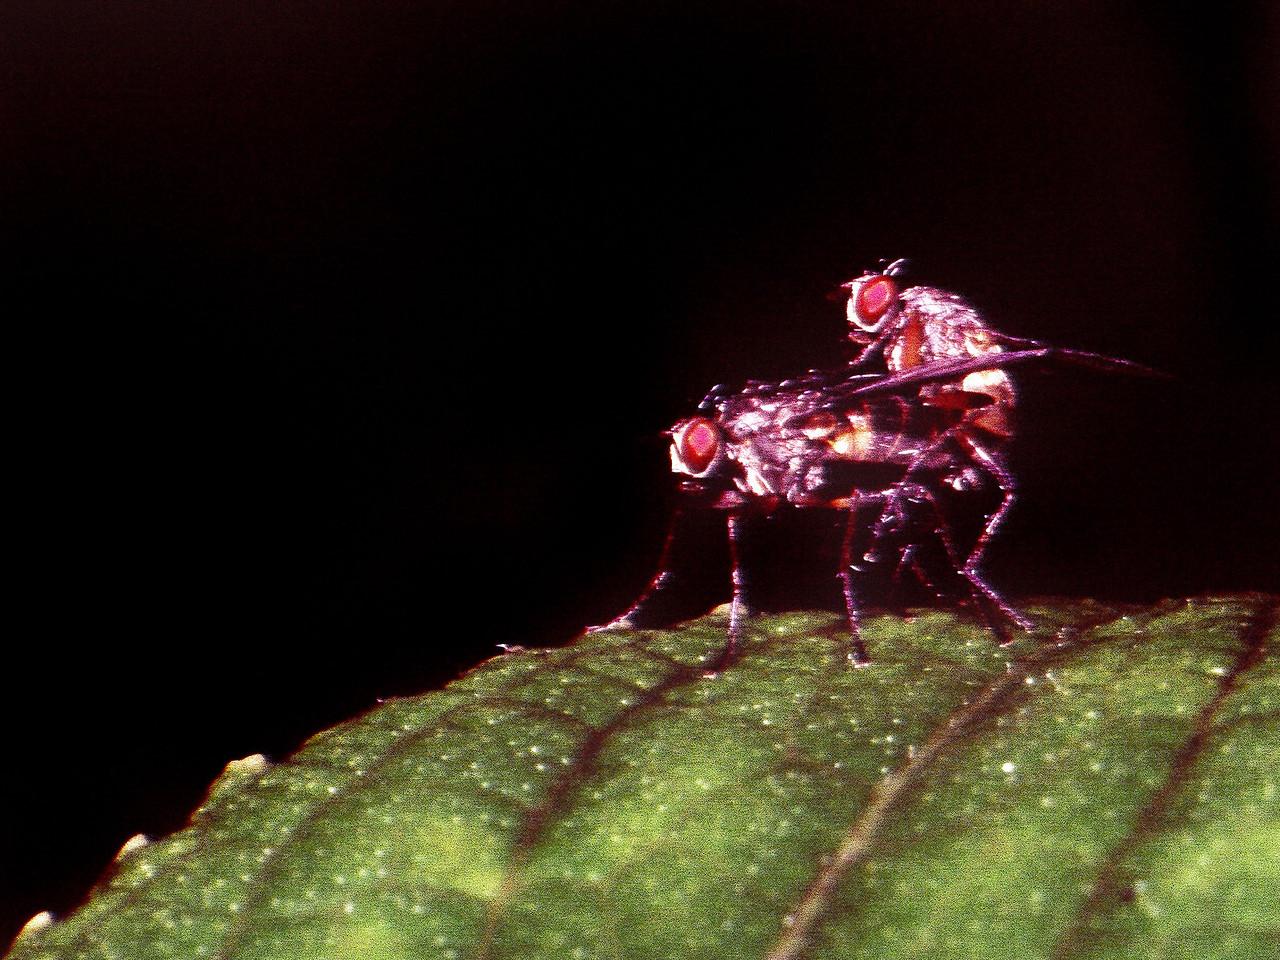 Lispocephala sp. (Diptera: Muscidae) on Broussaisia arguta, West Maui